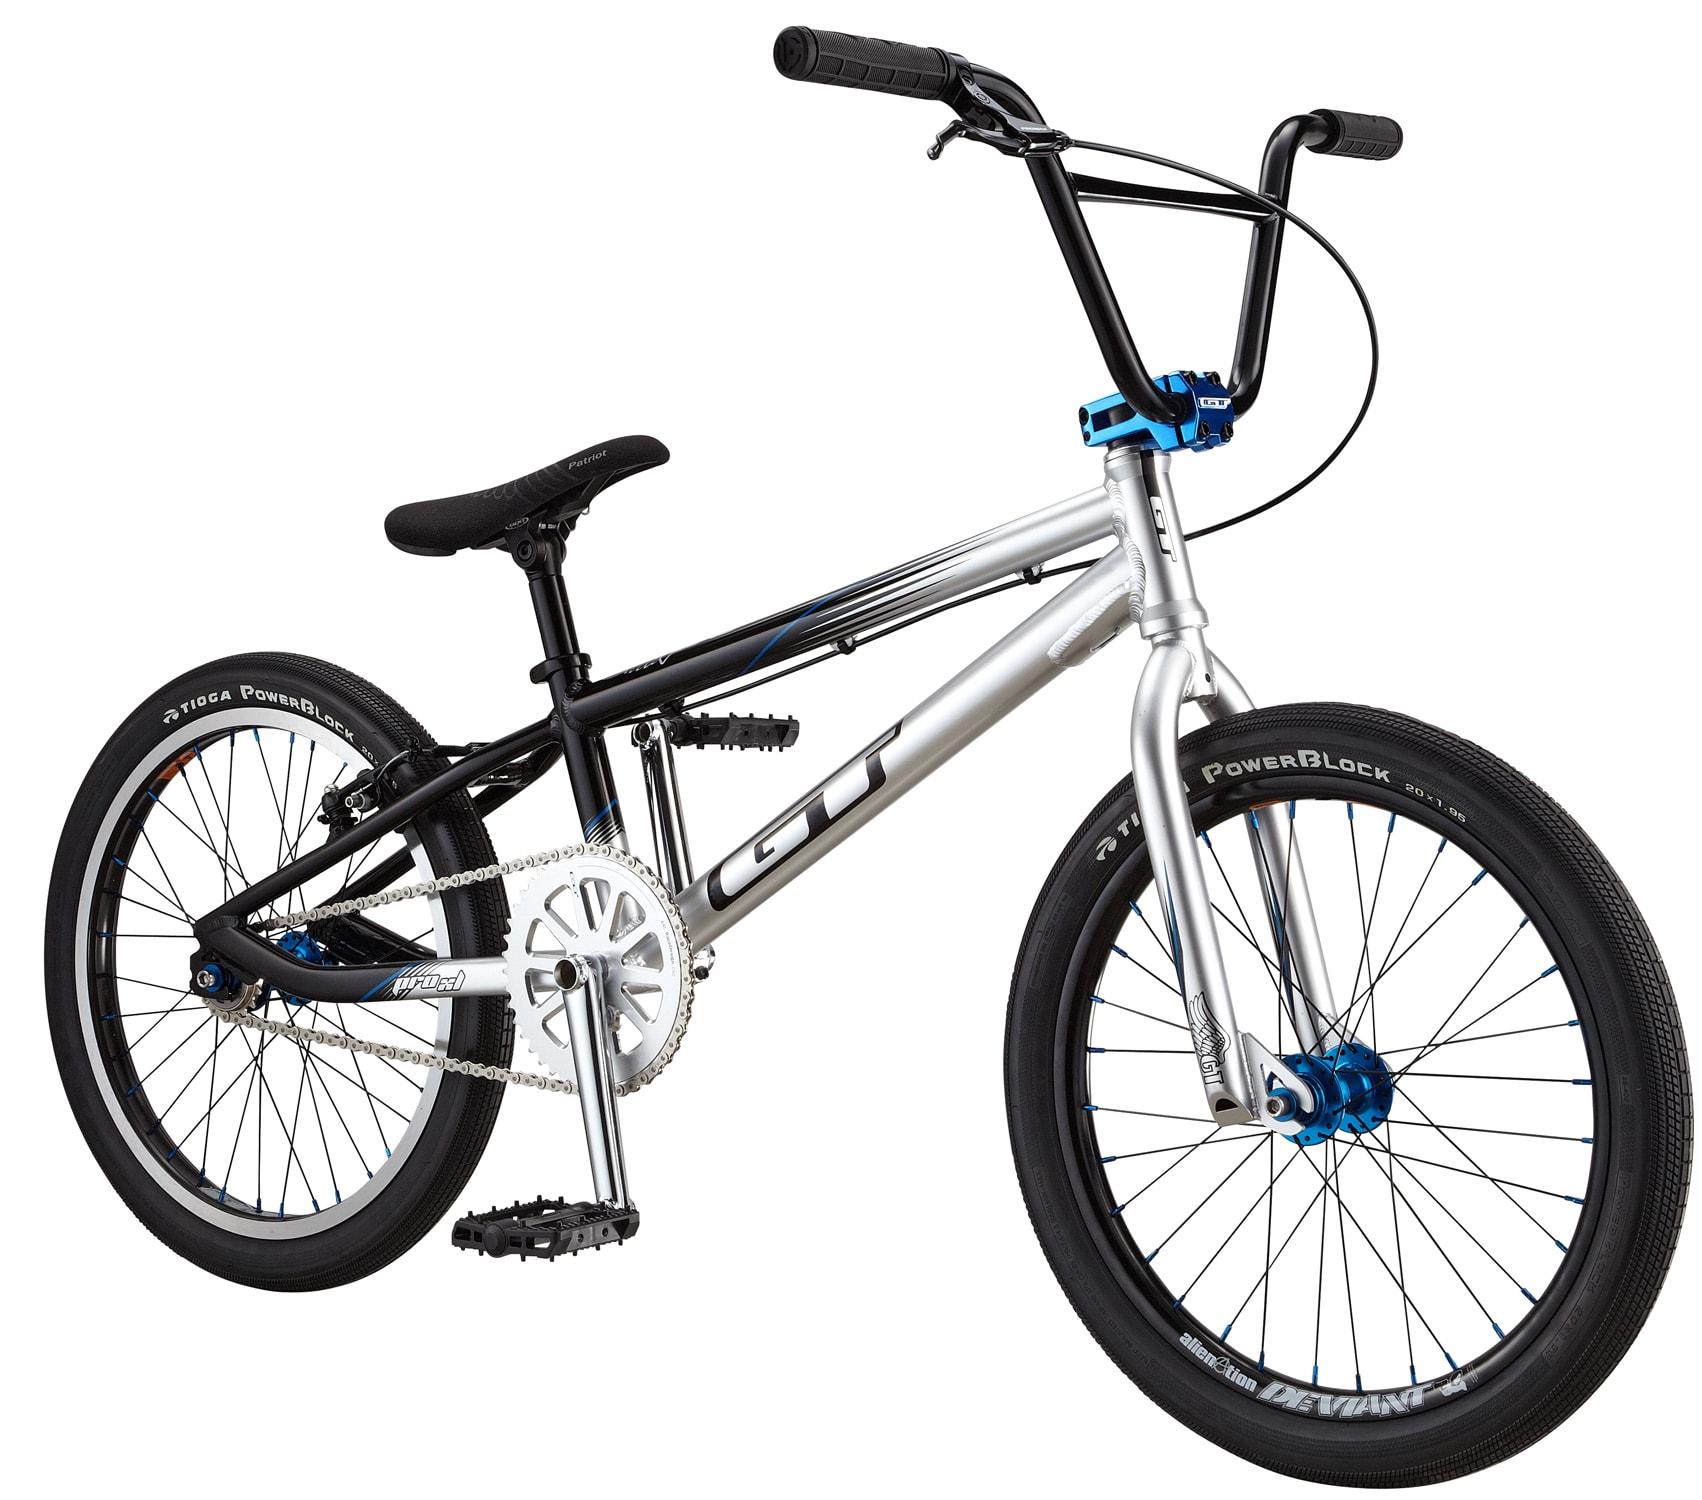 On Sale Gt Pro Series Pro Xl Bmx Bike Up To 55 Off